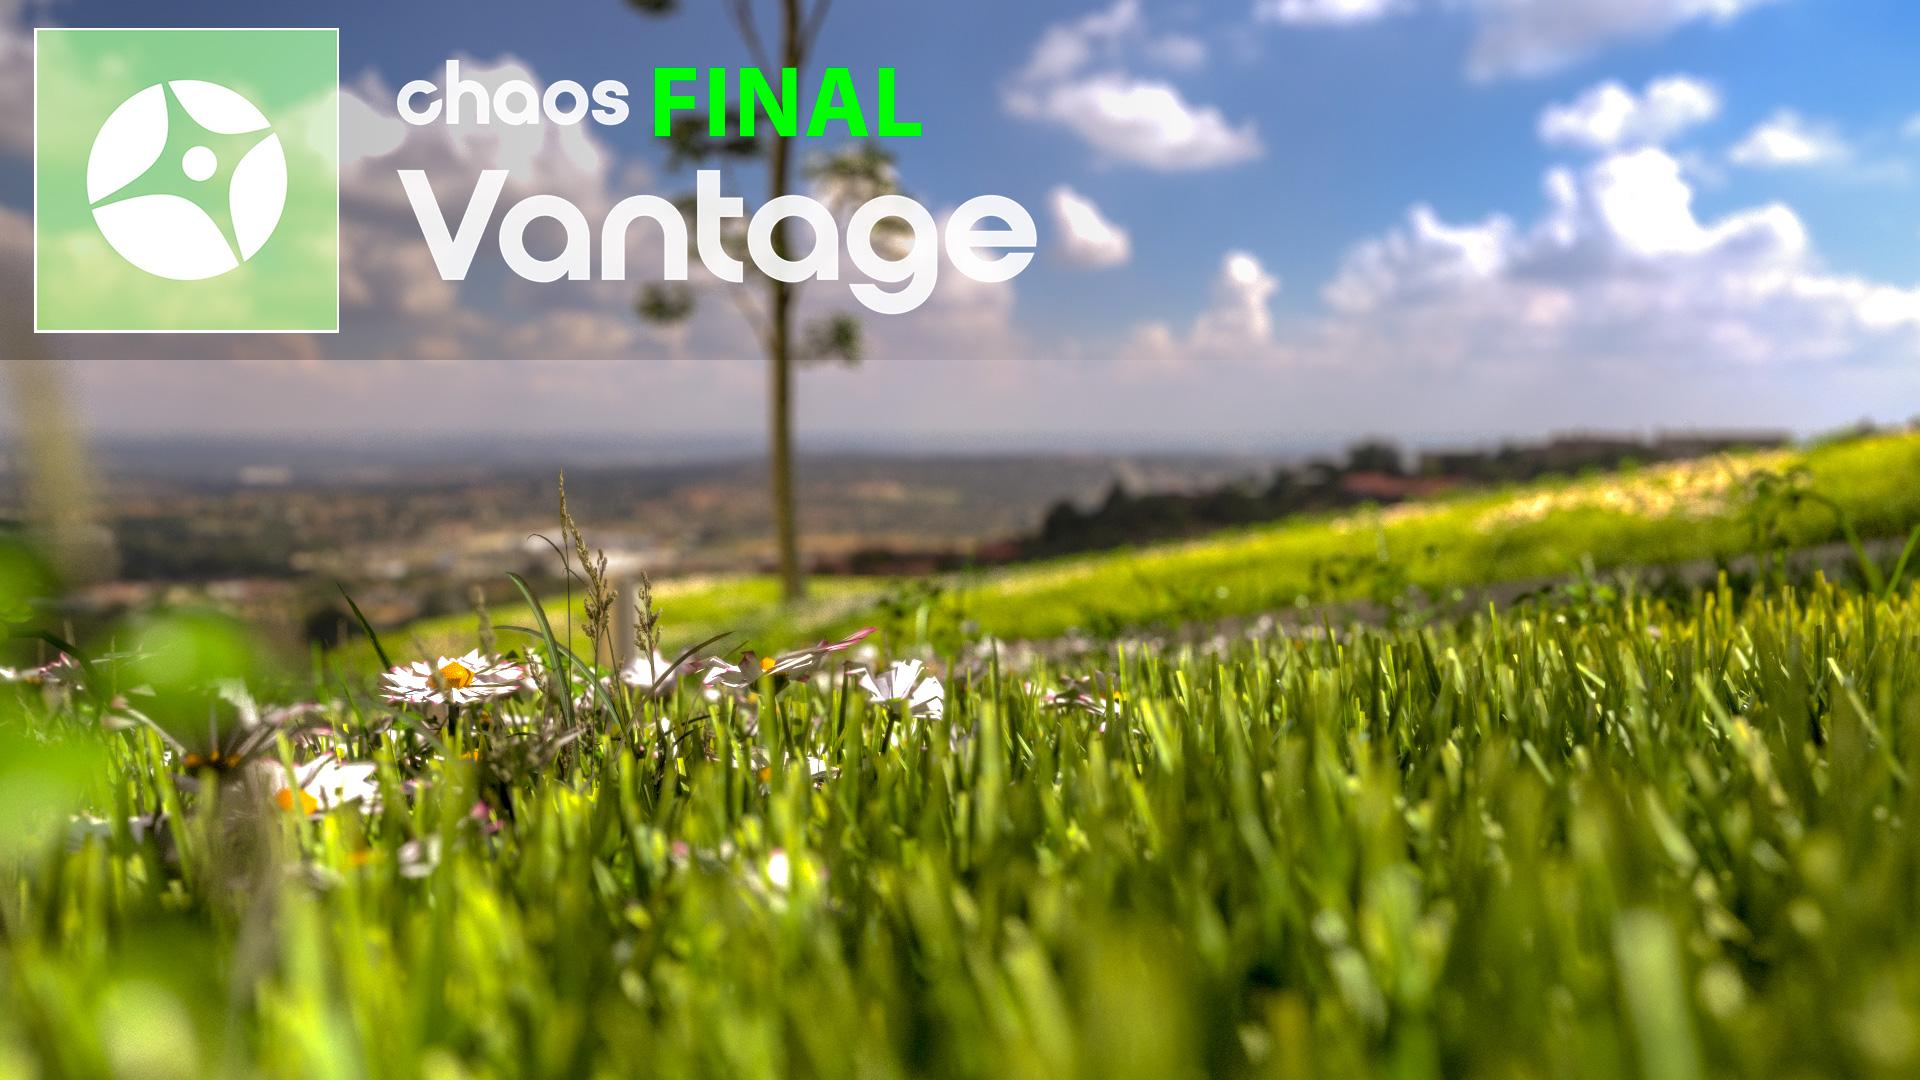 chaos_vantage_final_youtube.jpg